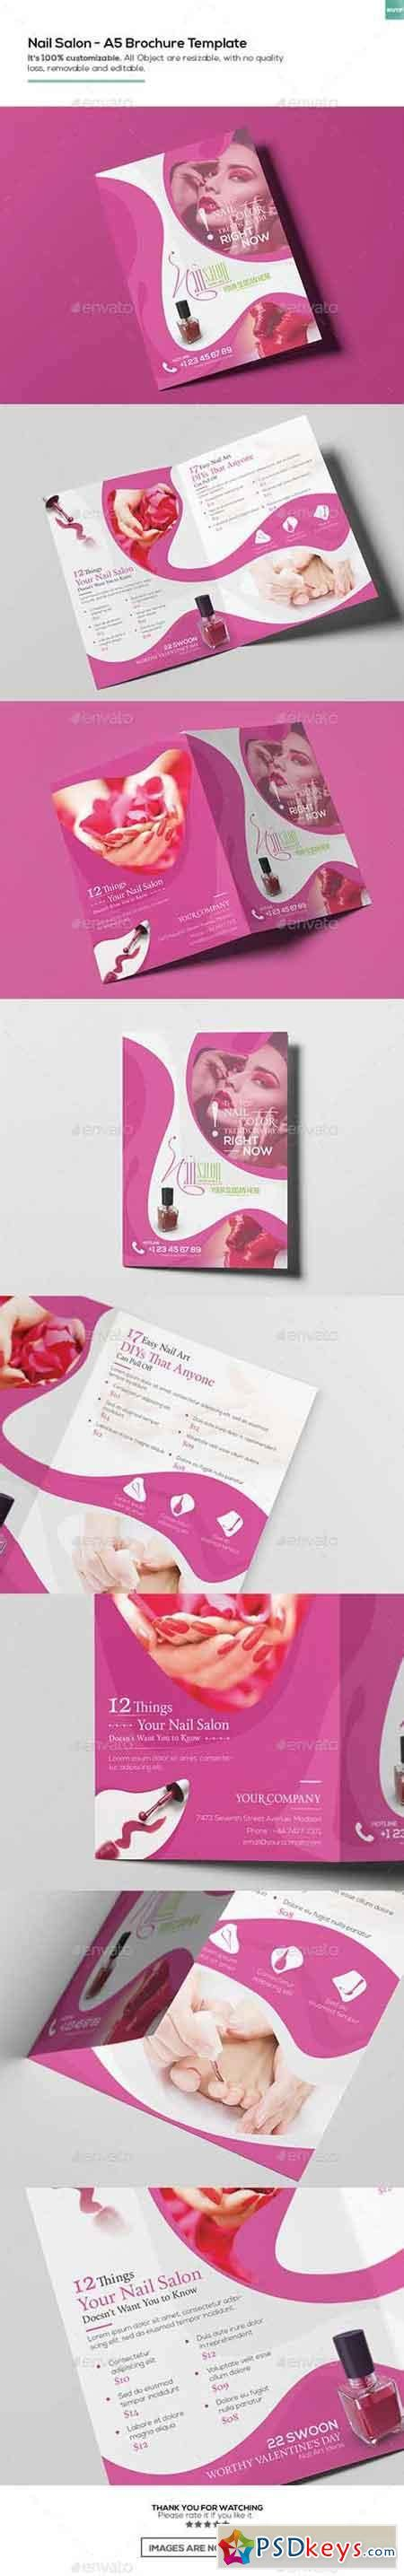 Nail 187 Free Download Photoshop Vector Stock Image Via Torrent Zippyshare From Psdkeys Com Nail Salon Brochure Template